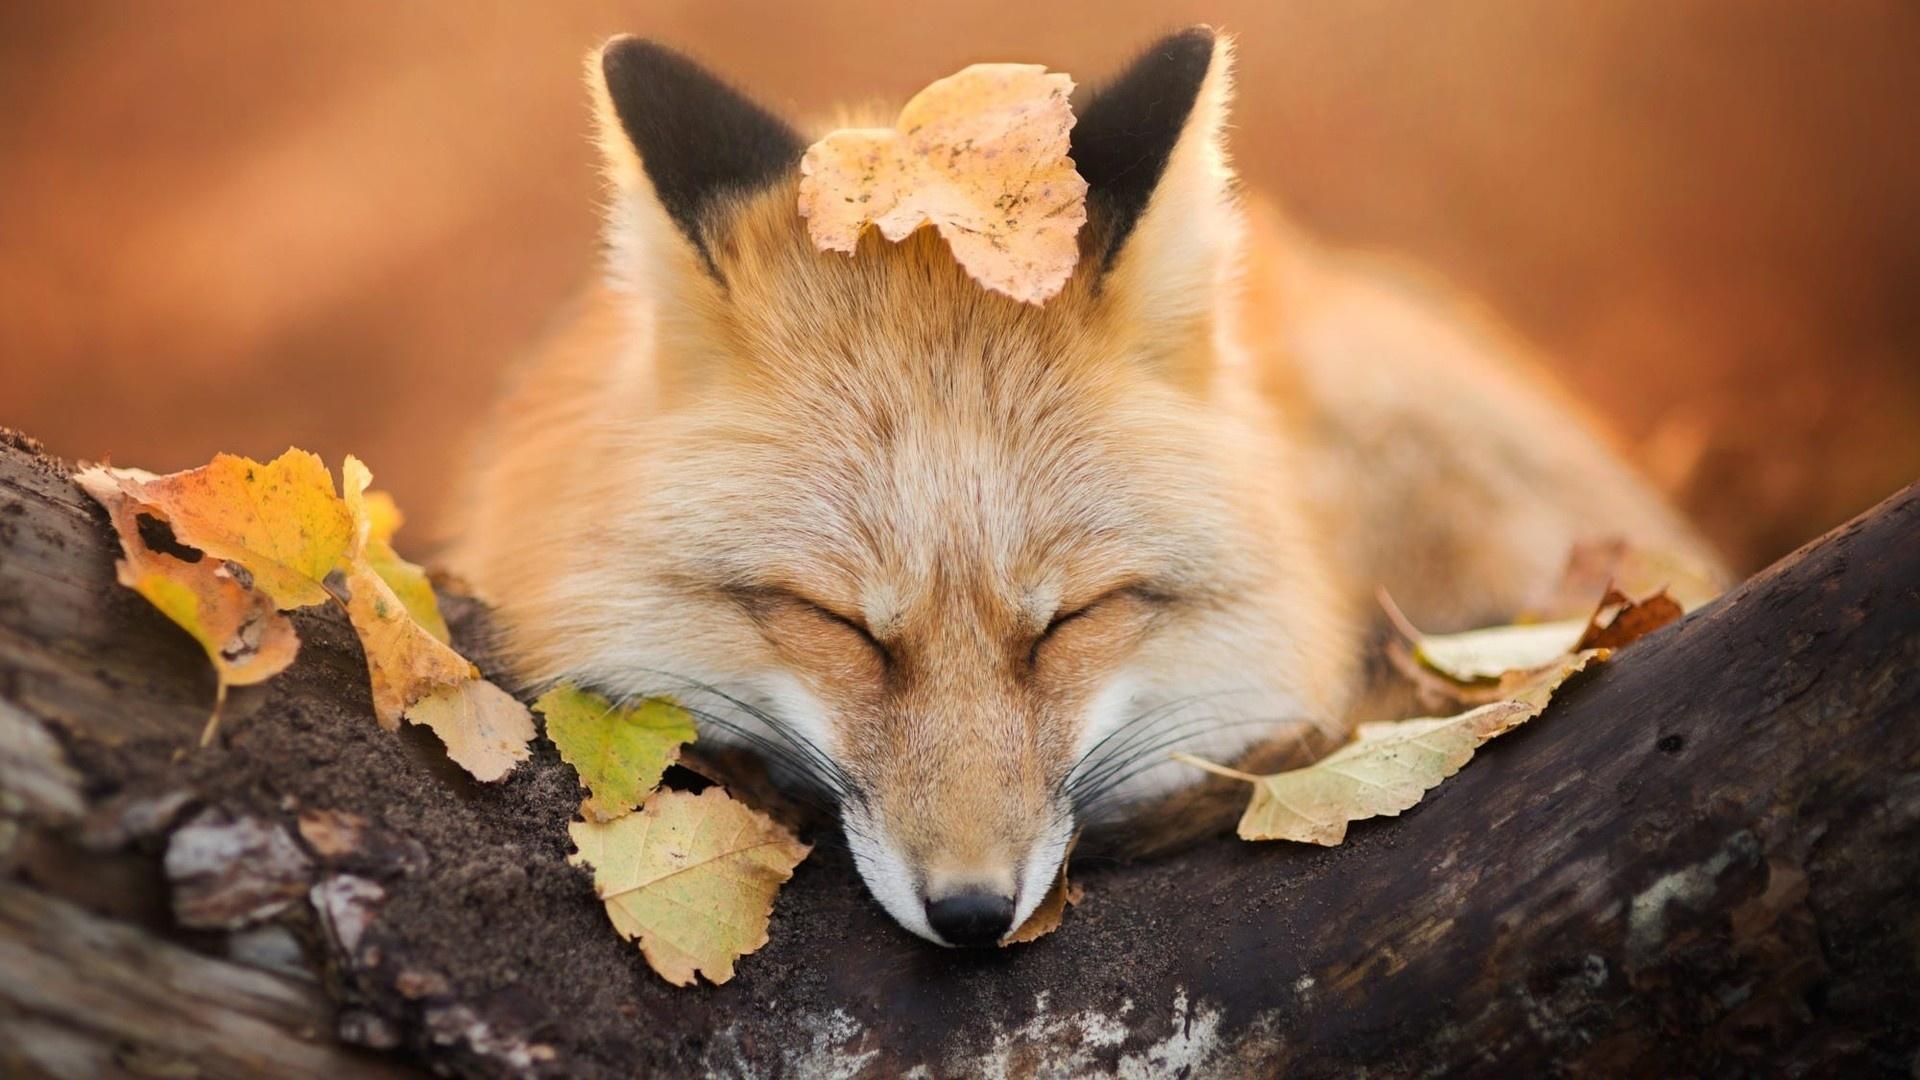 Animal In Autumn background wallpaper